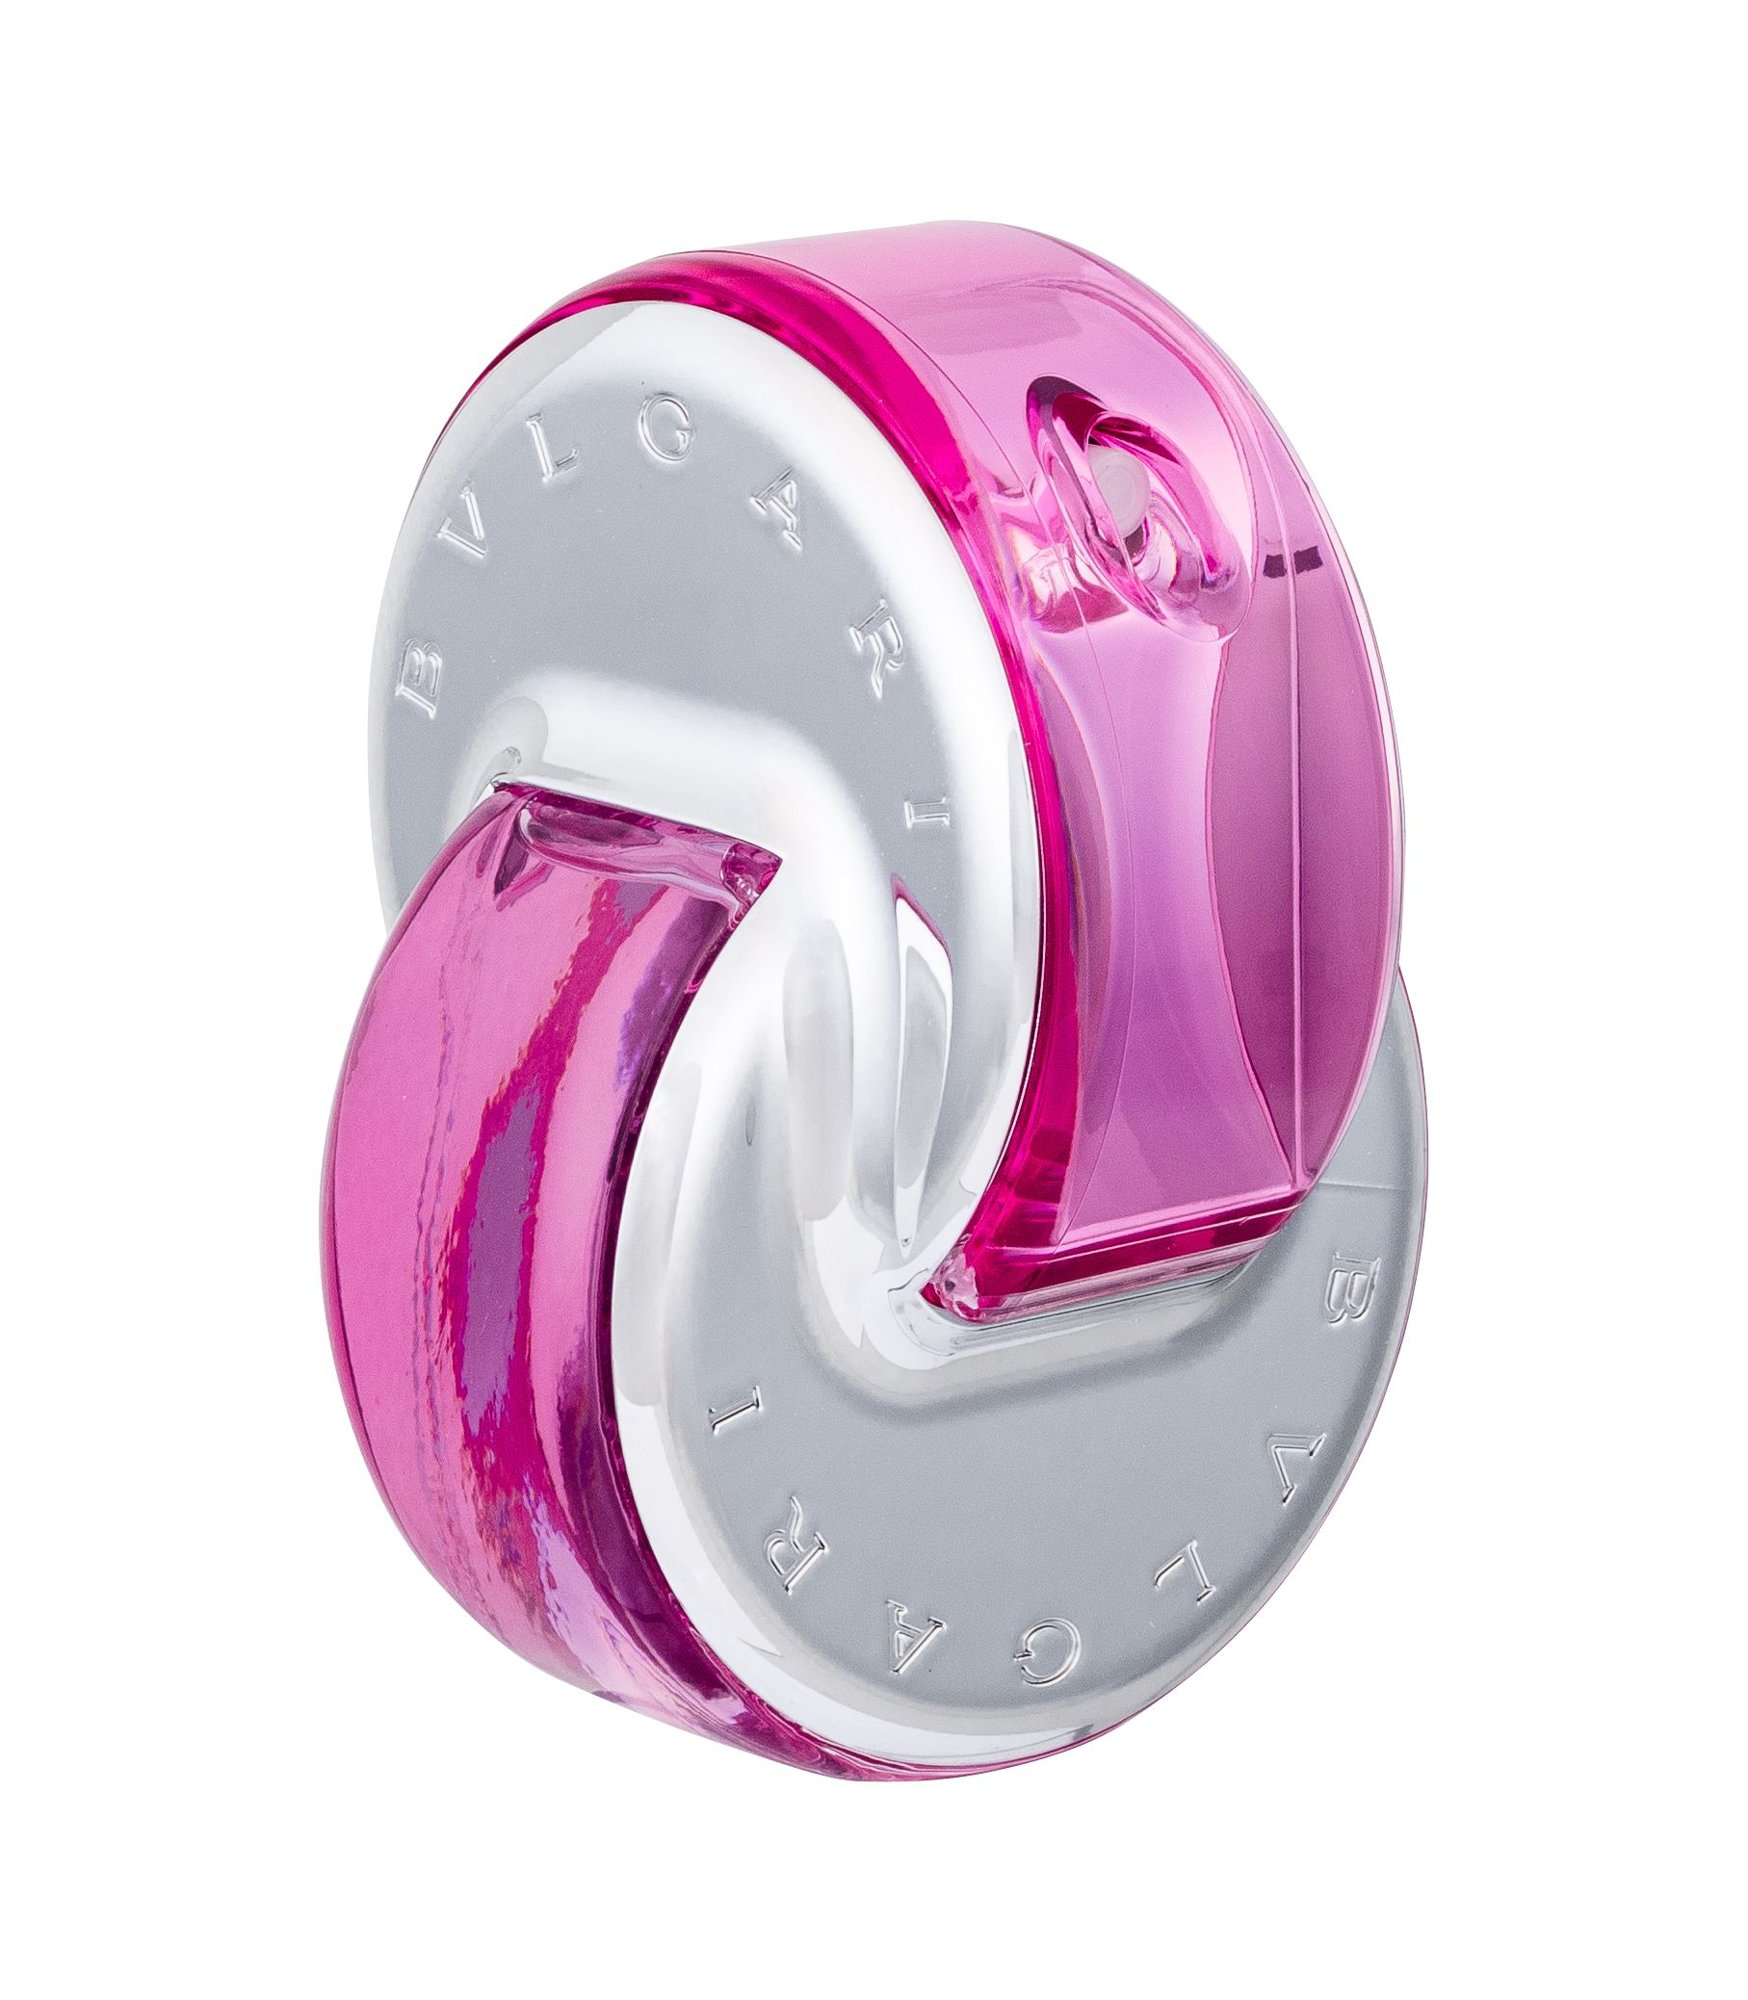 Bvlgari Omnia Pink Sapphire, Toaletná voda 65ml, Tester